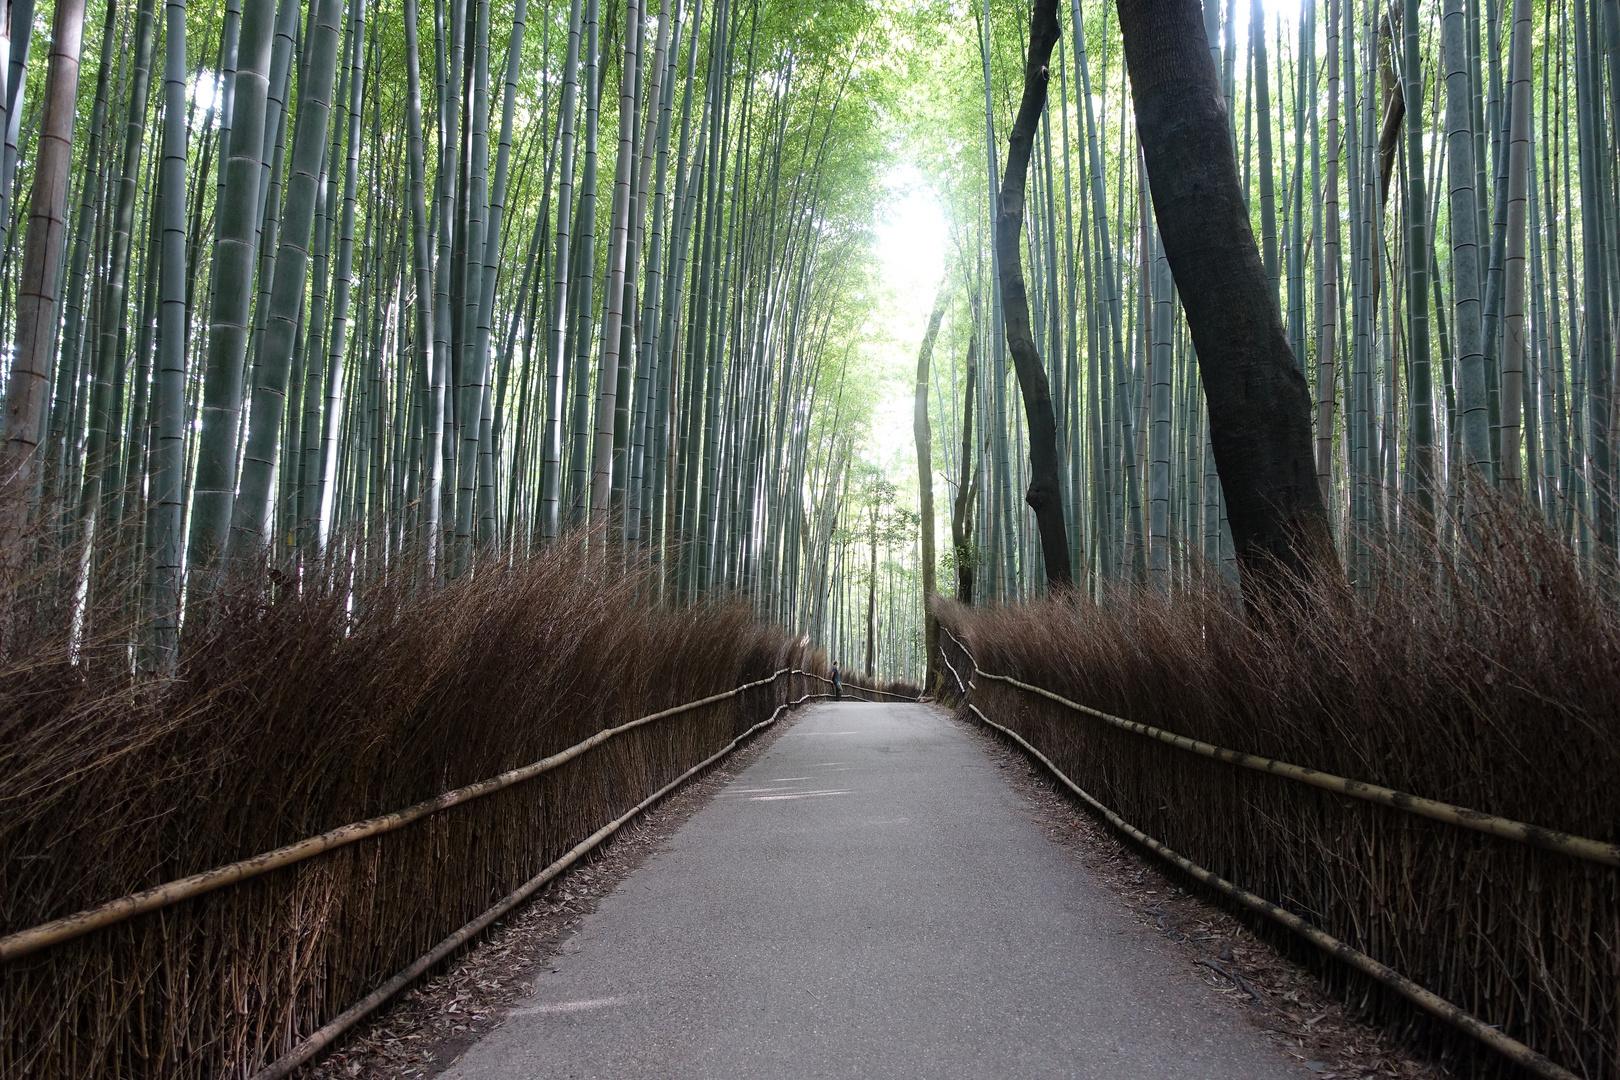 Bambuswald Arashiyama Bei Kyoto Foto Bild Japan Asia Kyoto